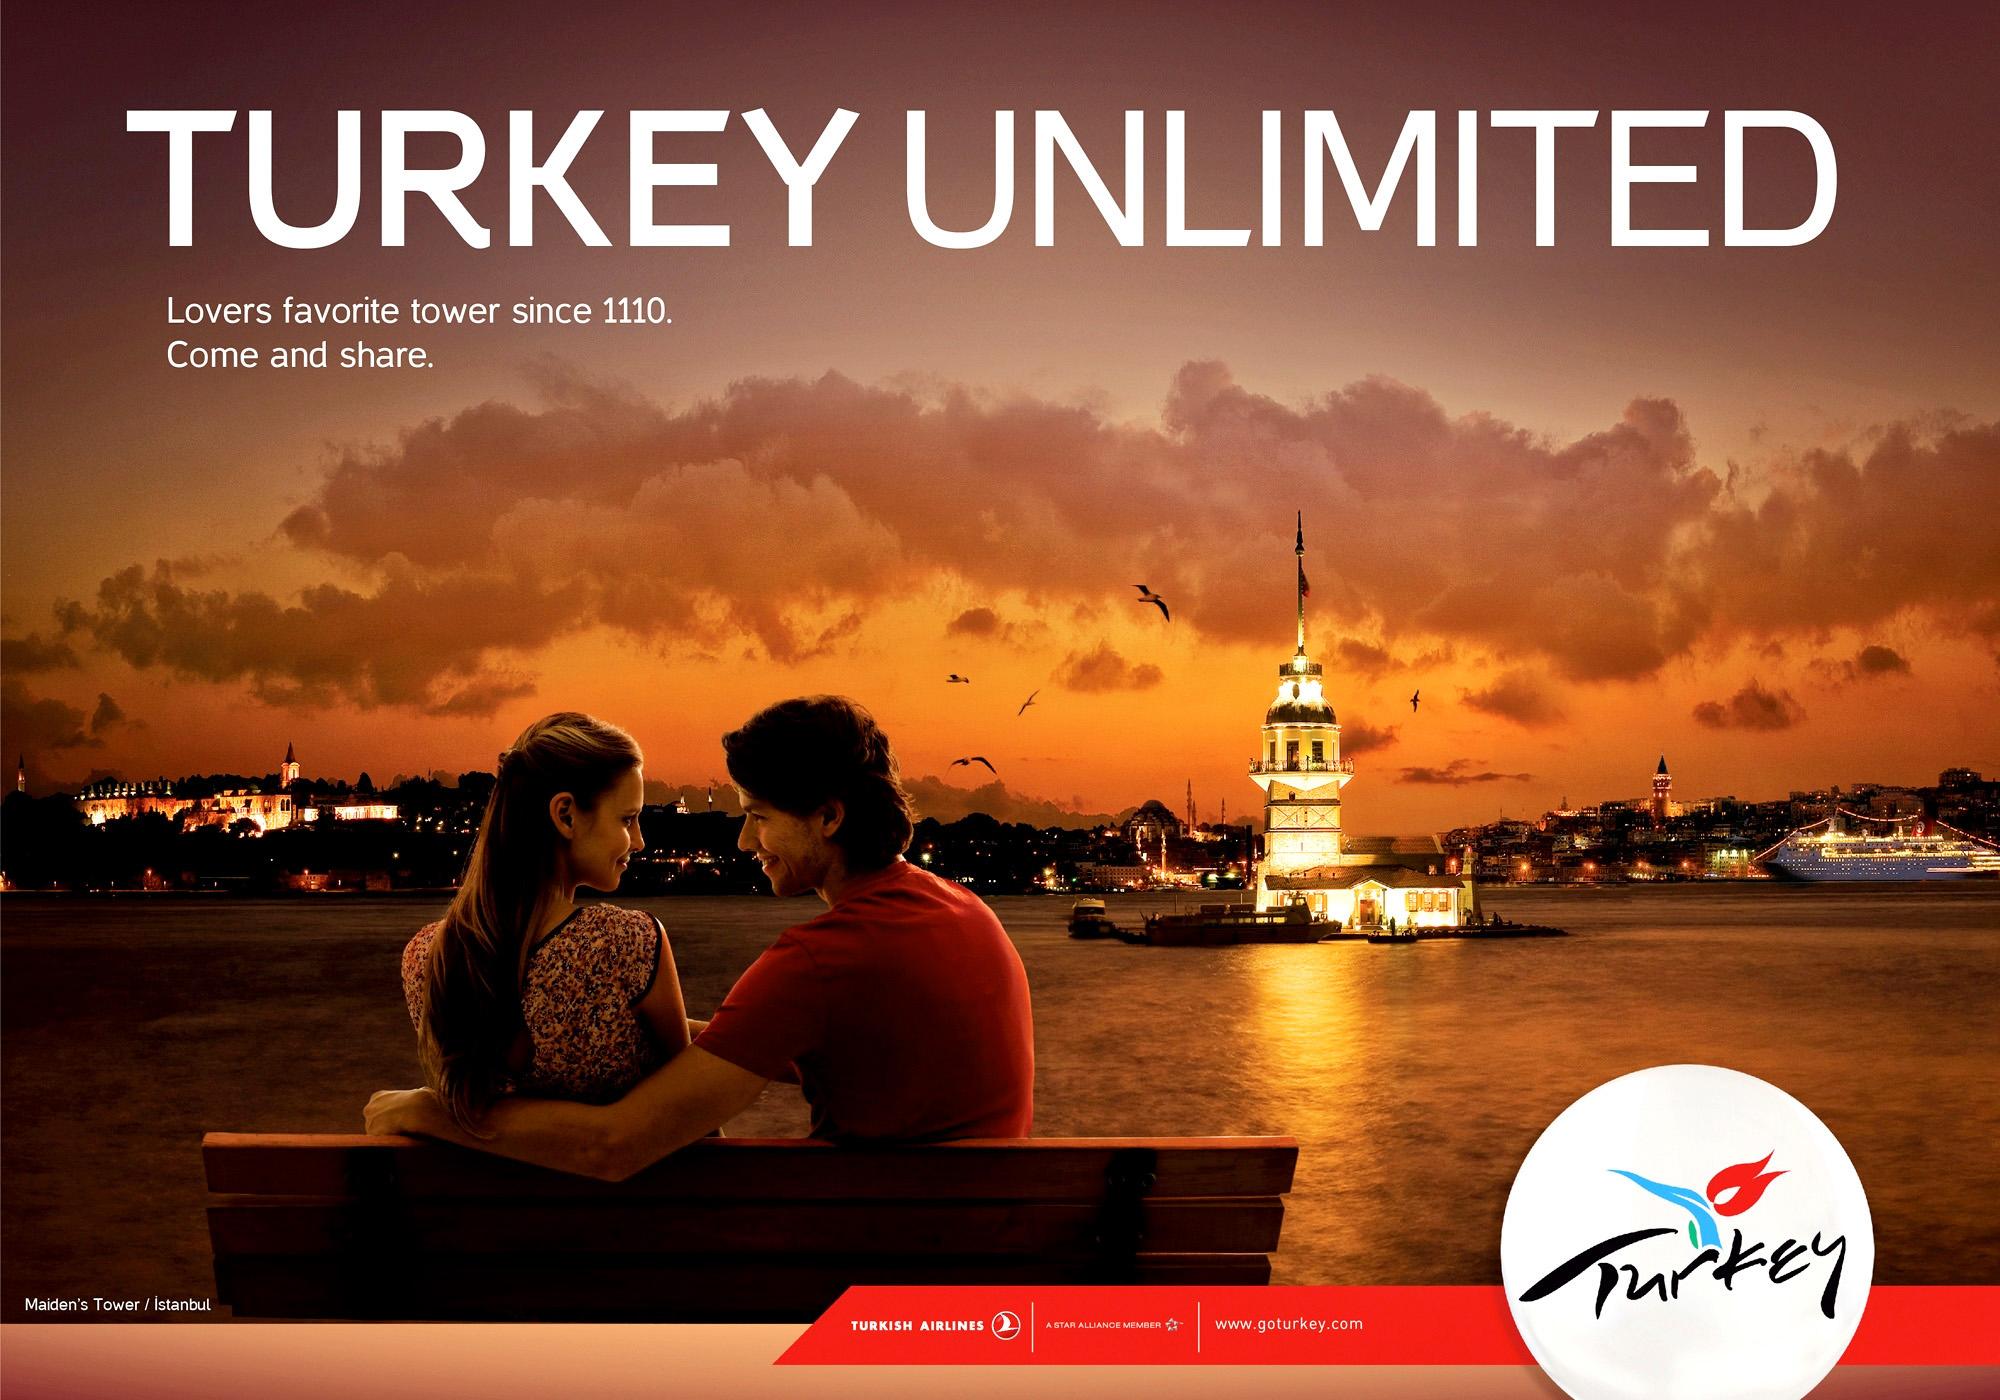 Turkey_2013_3